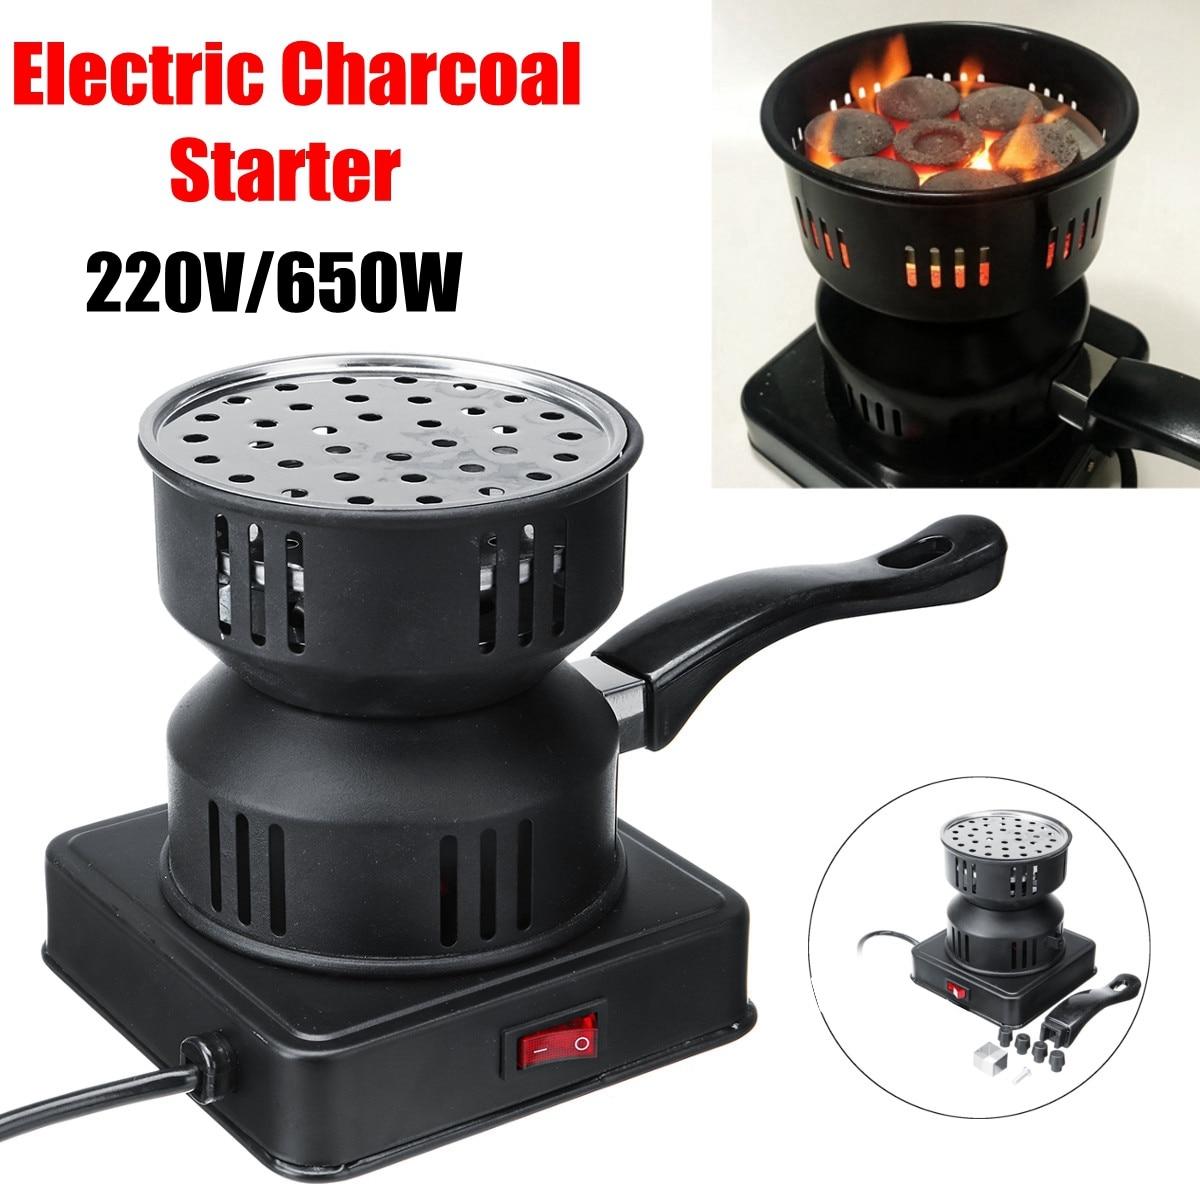 110V/220V 60HZ 650W Arabian Shisha Charcoal Burner Heater Stove Electric Camping Cooking Stove